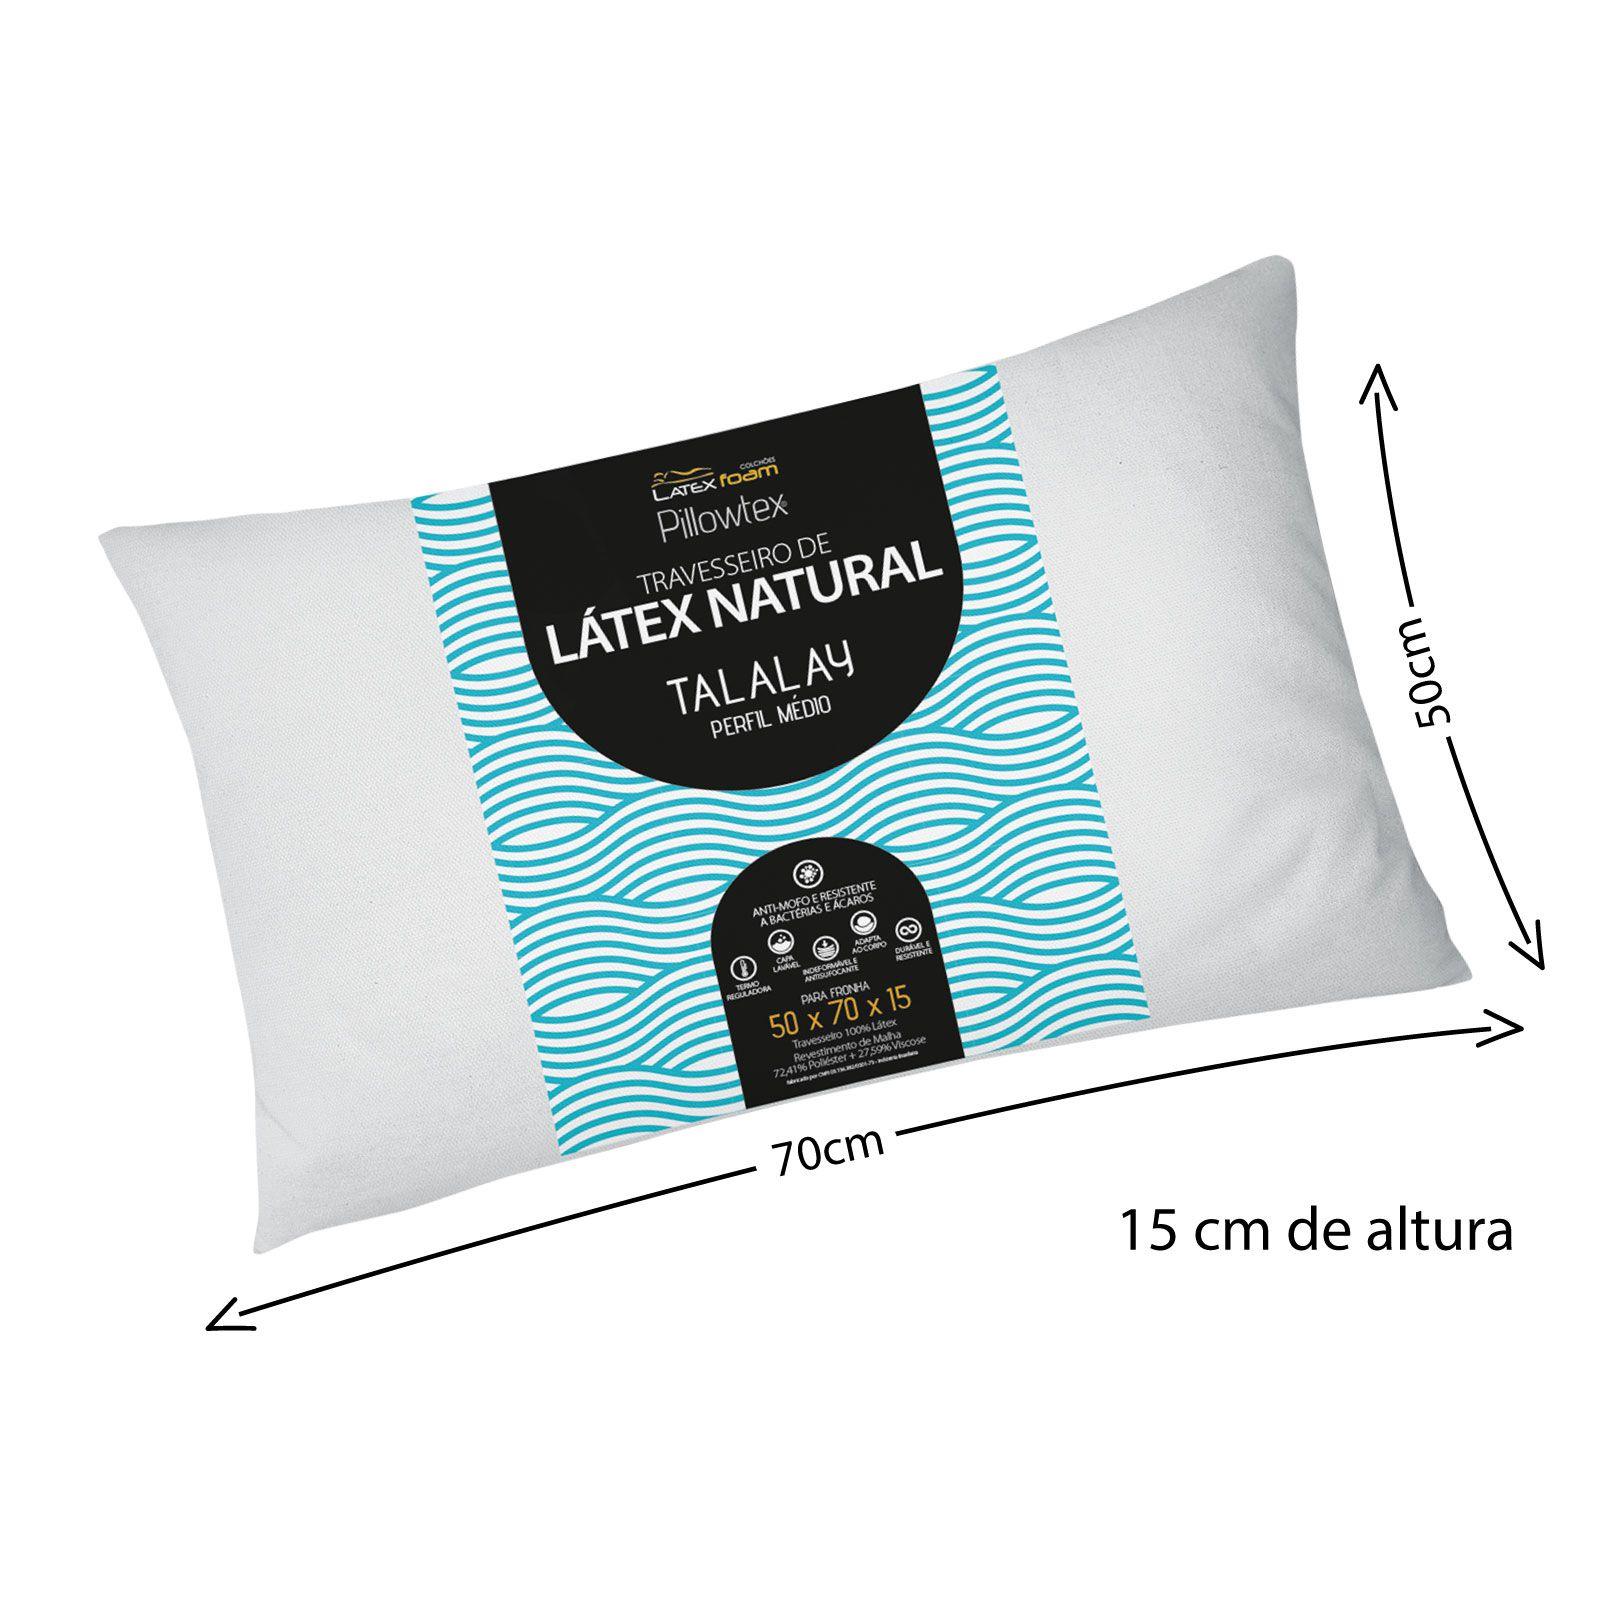 Travesseiro de Látex Talalay Perfil Médio